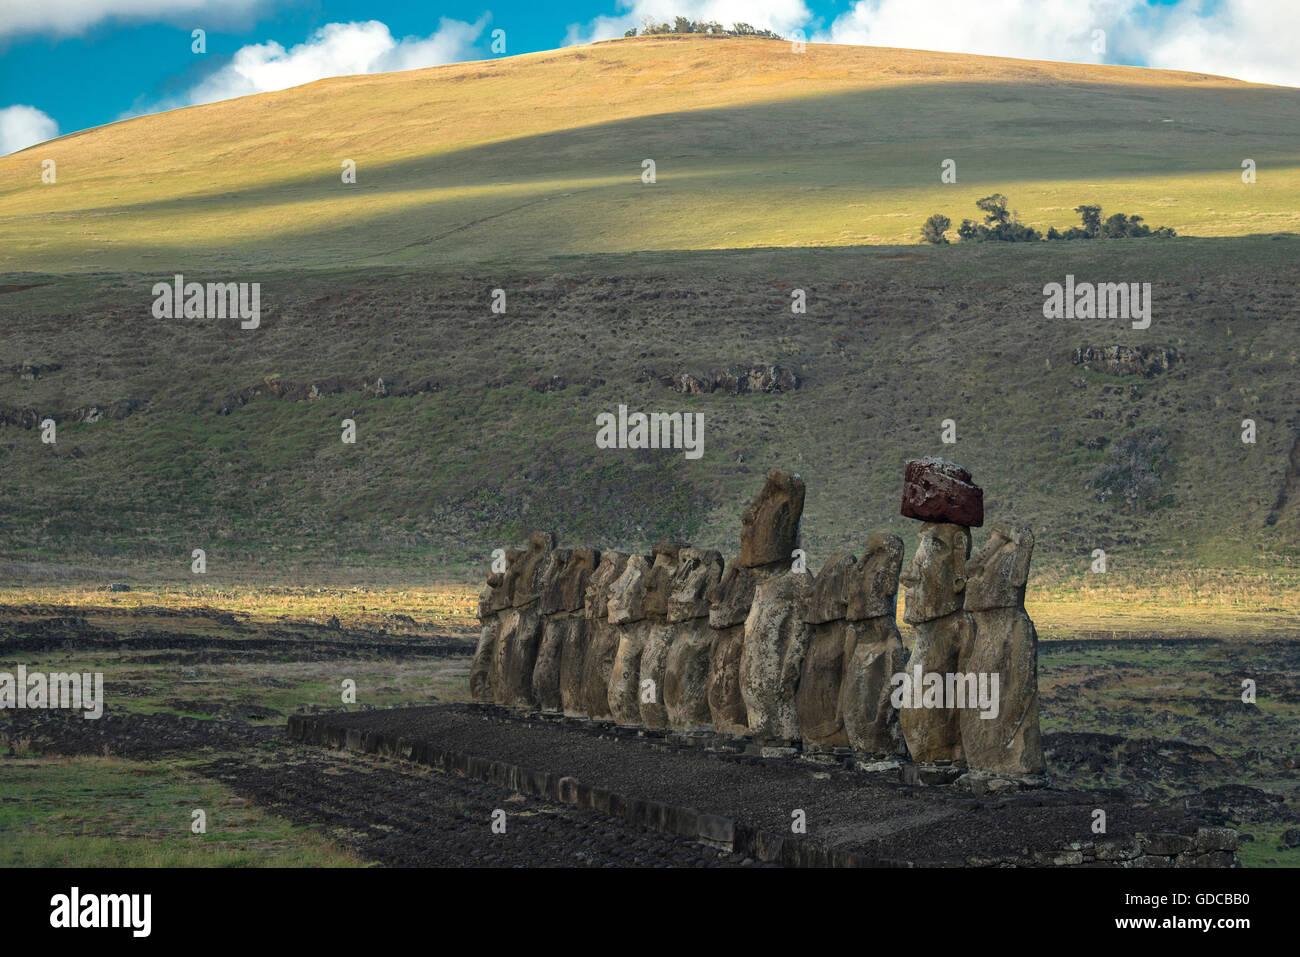 América del Sur, Chile, Isla de Pascua, Isla de Pasqua,pacífico sur,la UNESCO, Patrimonio Mundial, Imagen De Stock